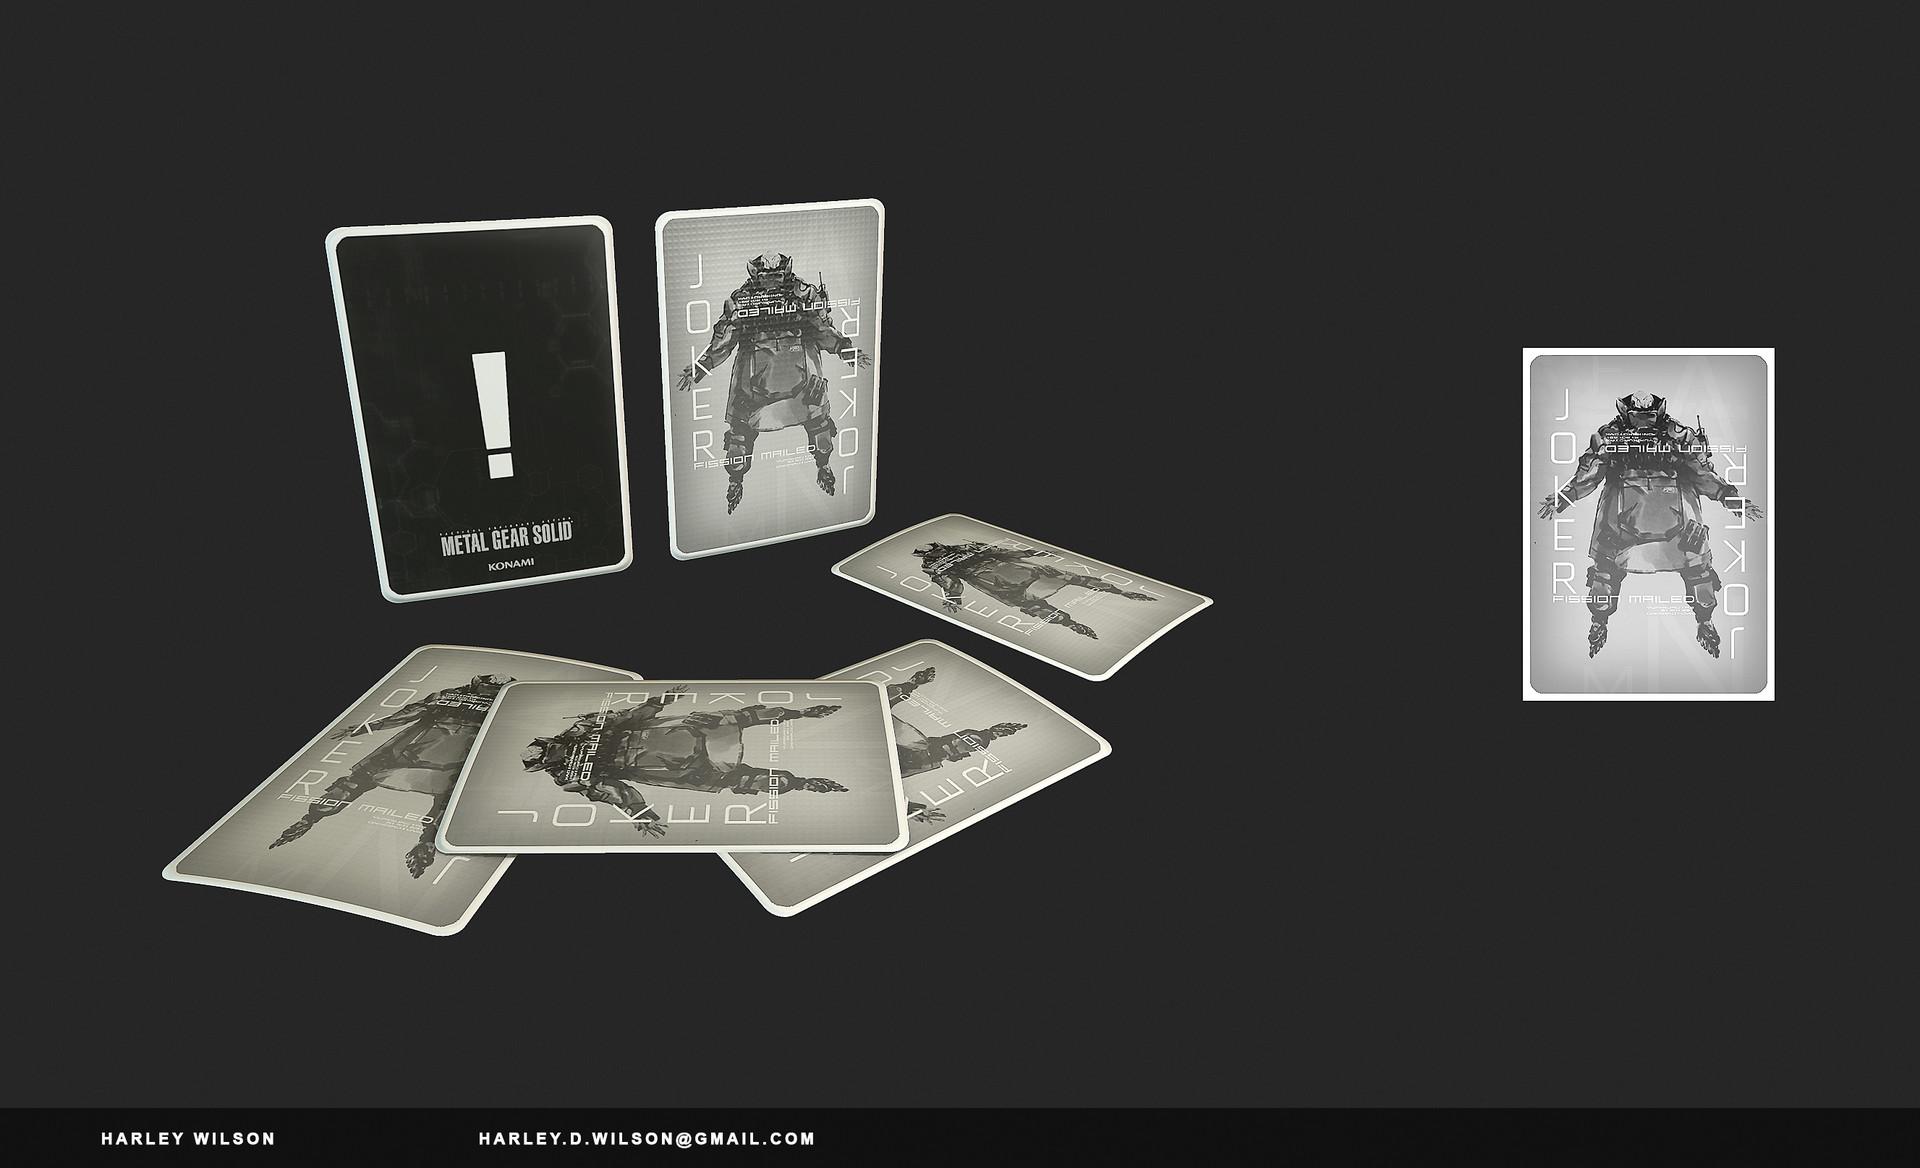 Harley wilson gd playingcards b